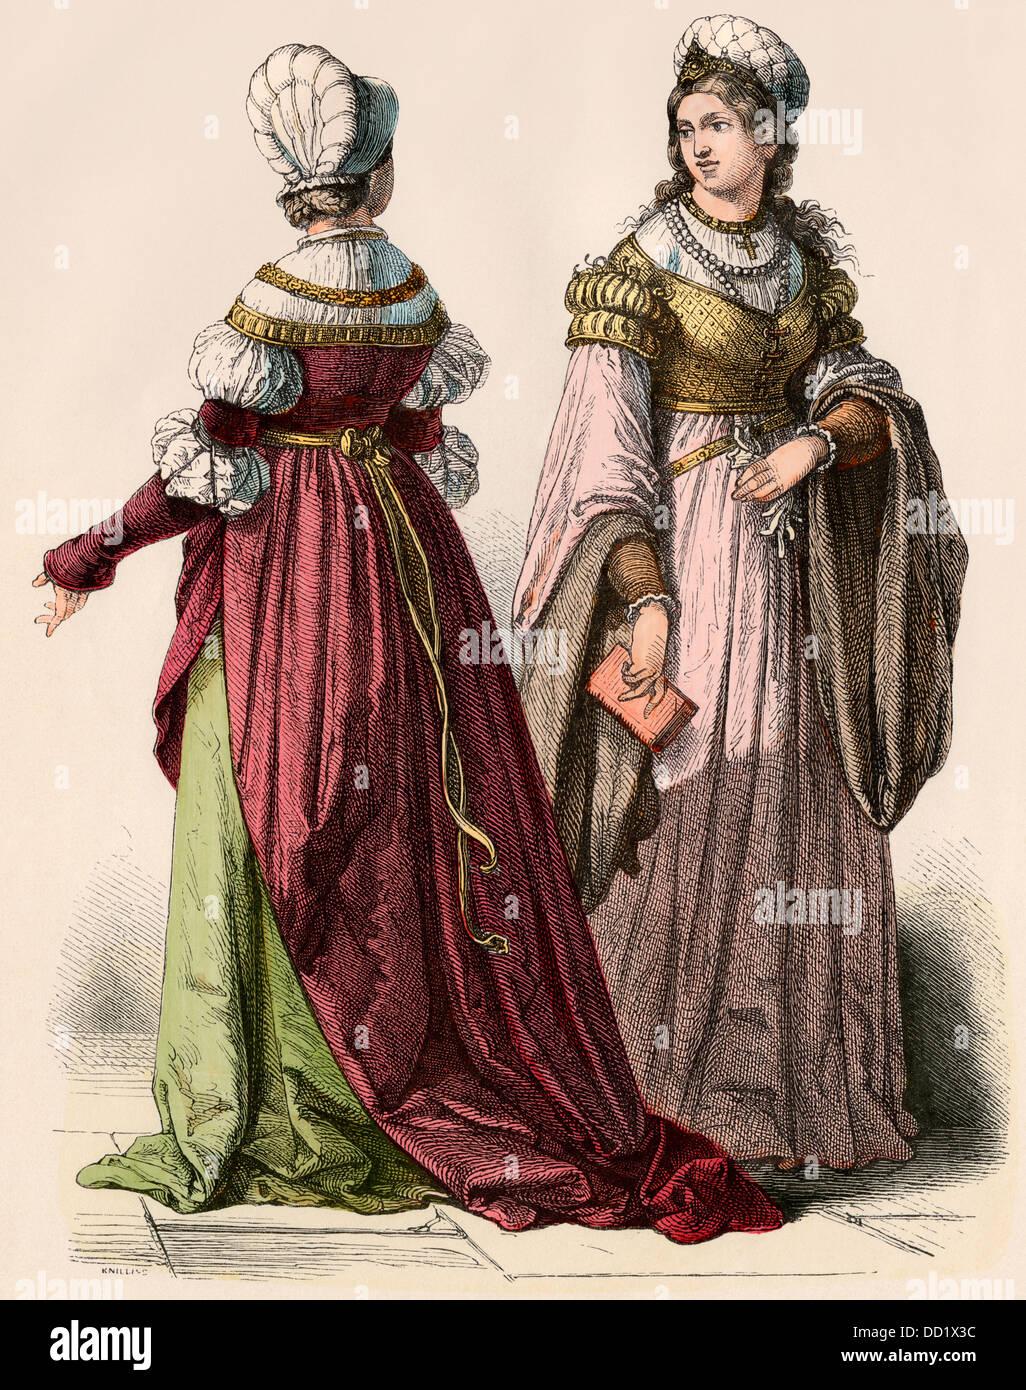 German clothing style fashion